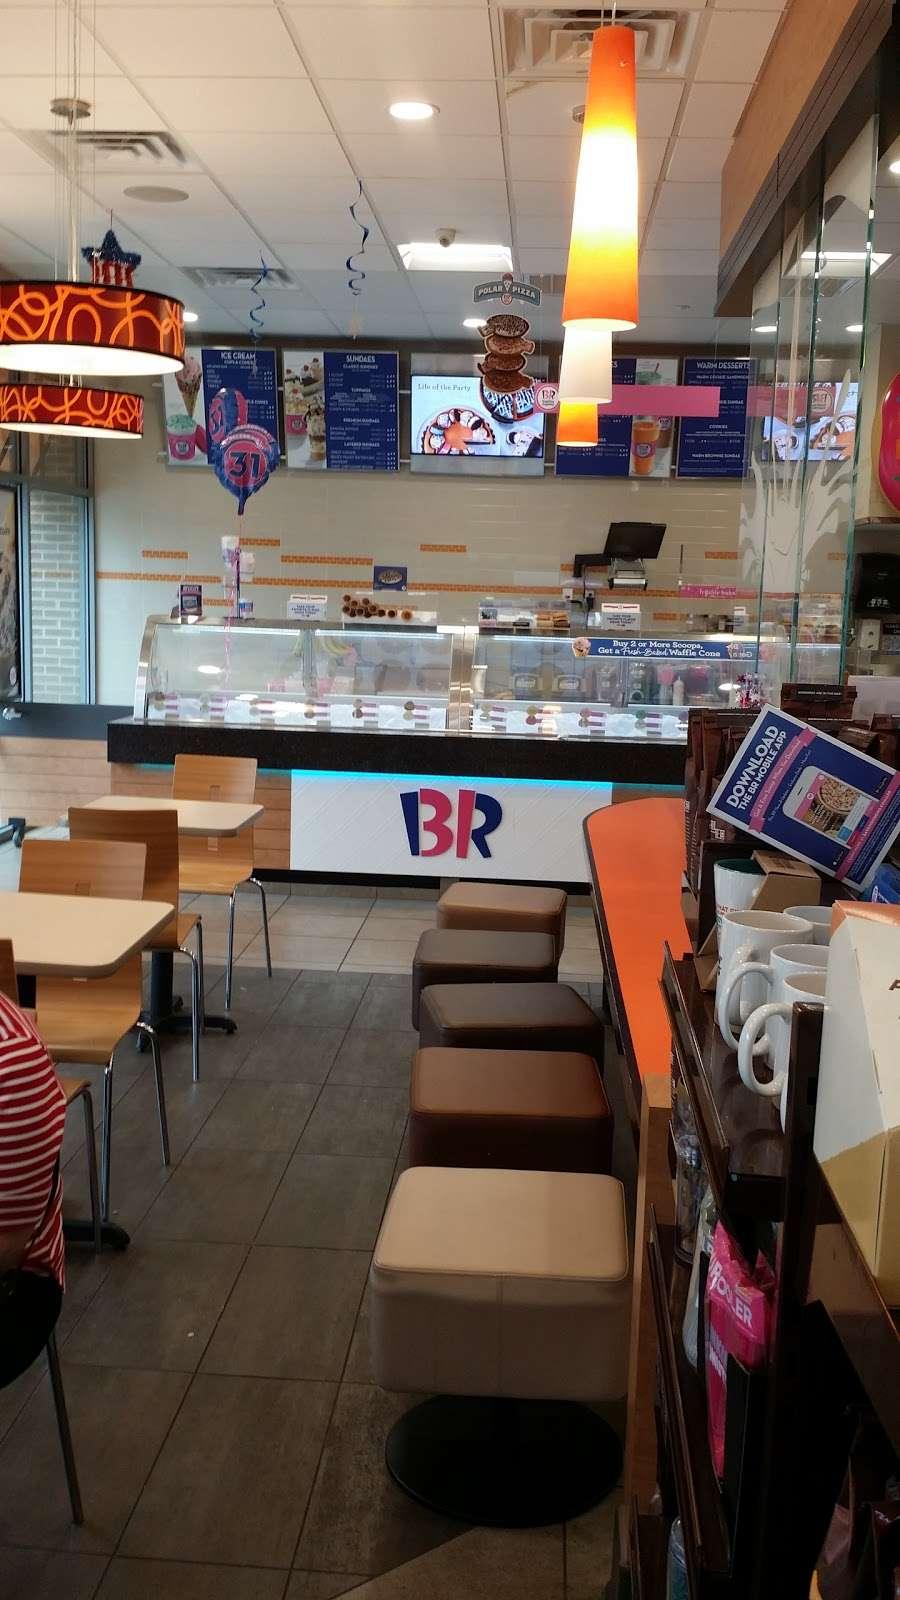 Dunkin Donuts - cafe  | Photo 7 of 10 | Address: 699 Avalon Drive, Wood-Ridge, NJ 07075, USA | Phone: (201) 203-1866